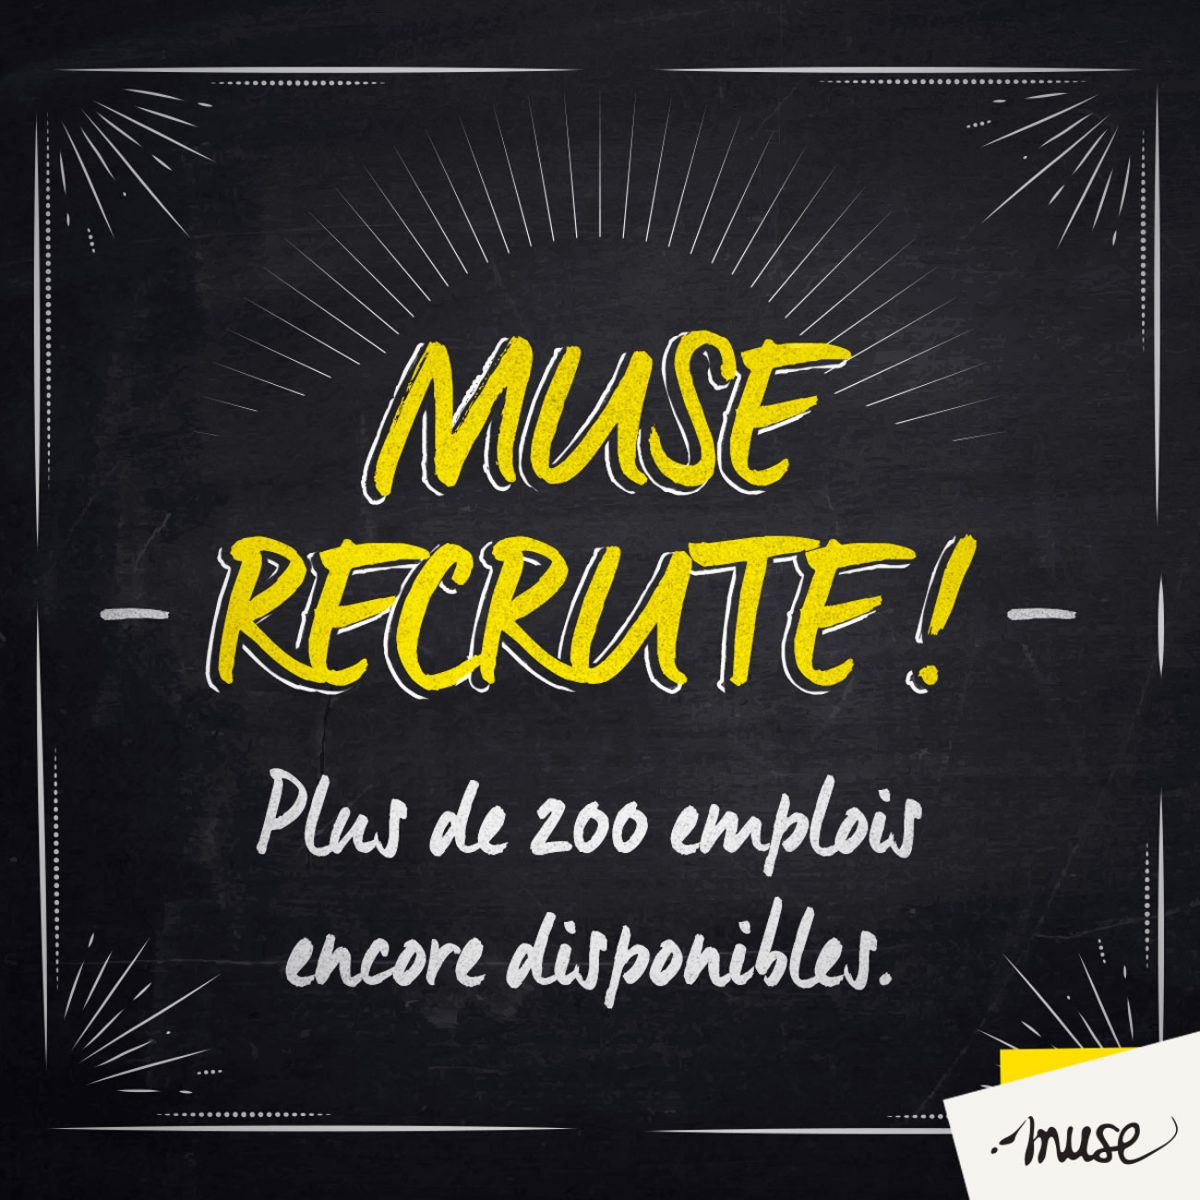 Metz : Muse recrute encore